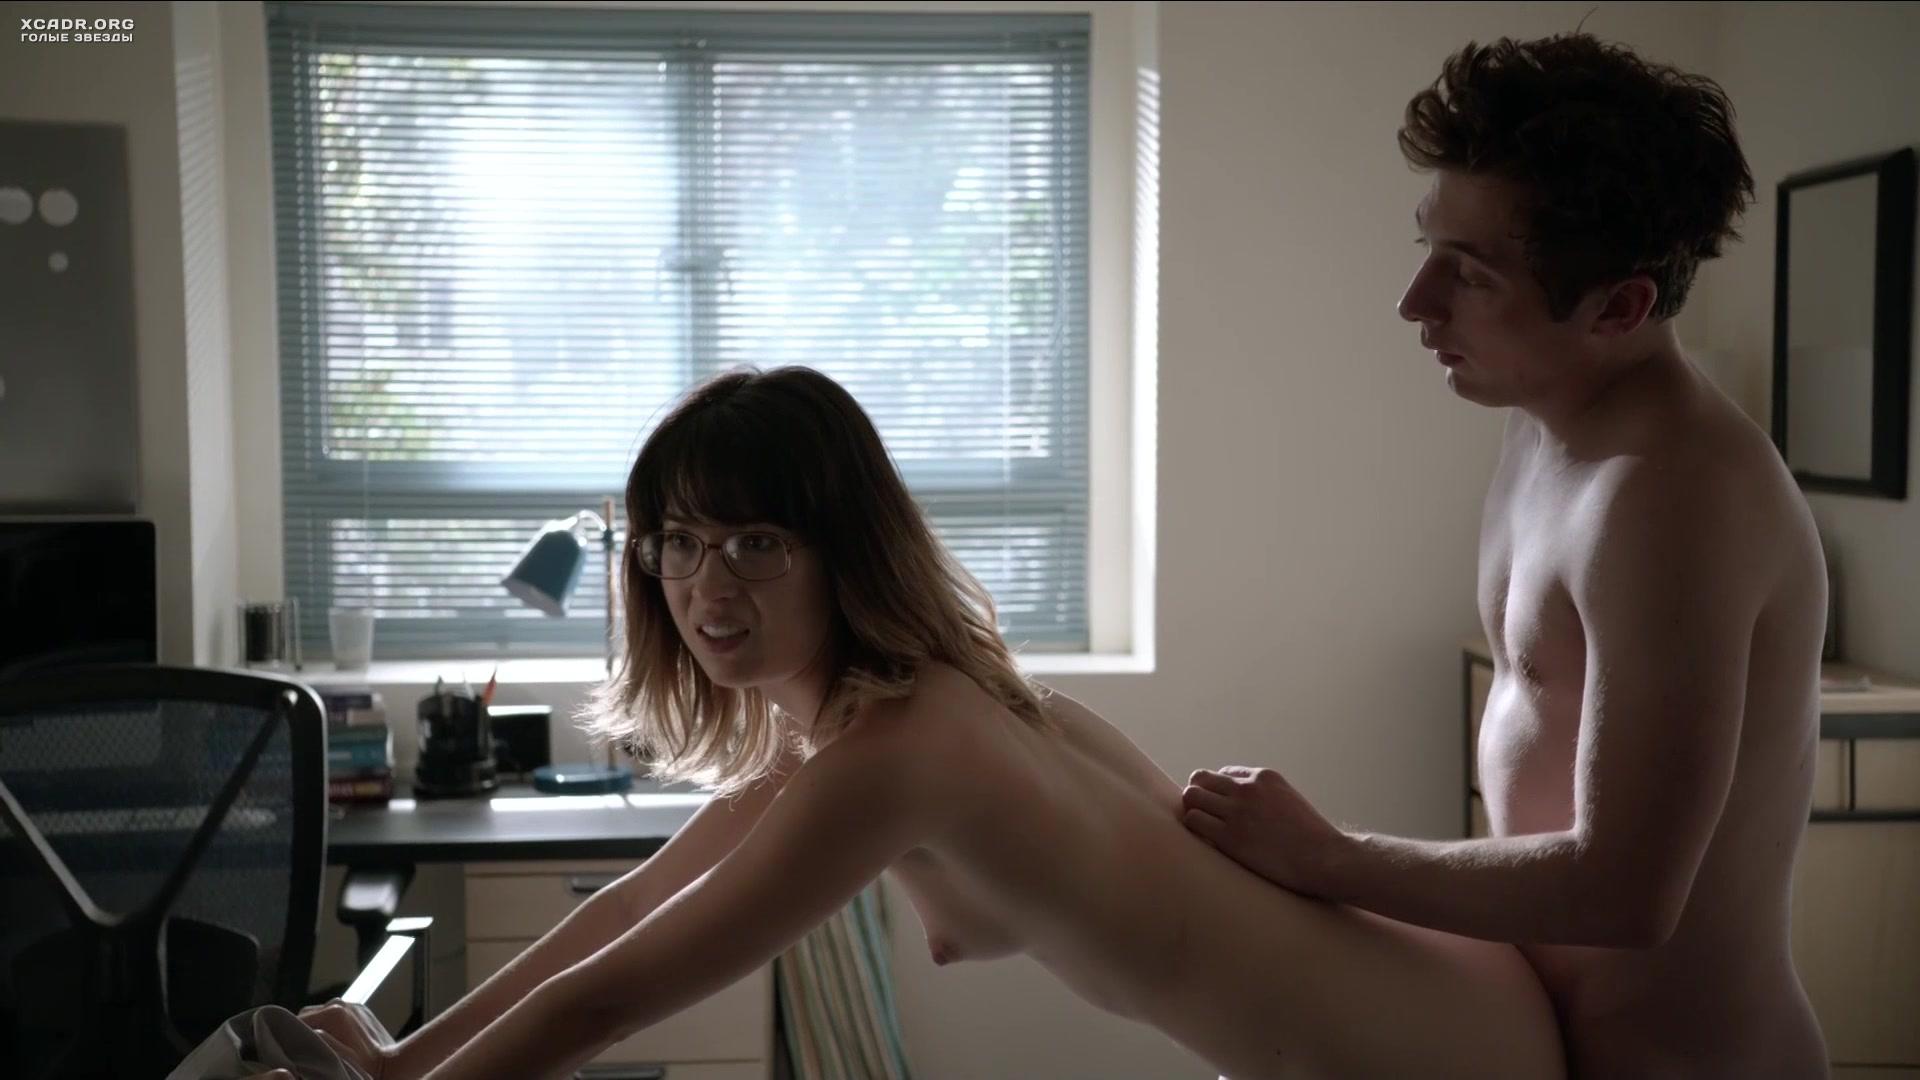 besstizhie-porno-momenti